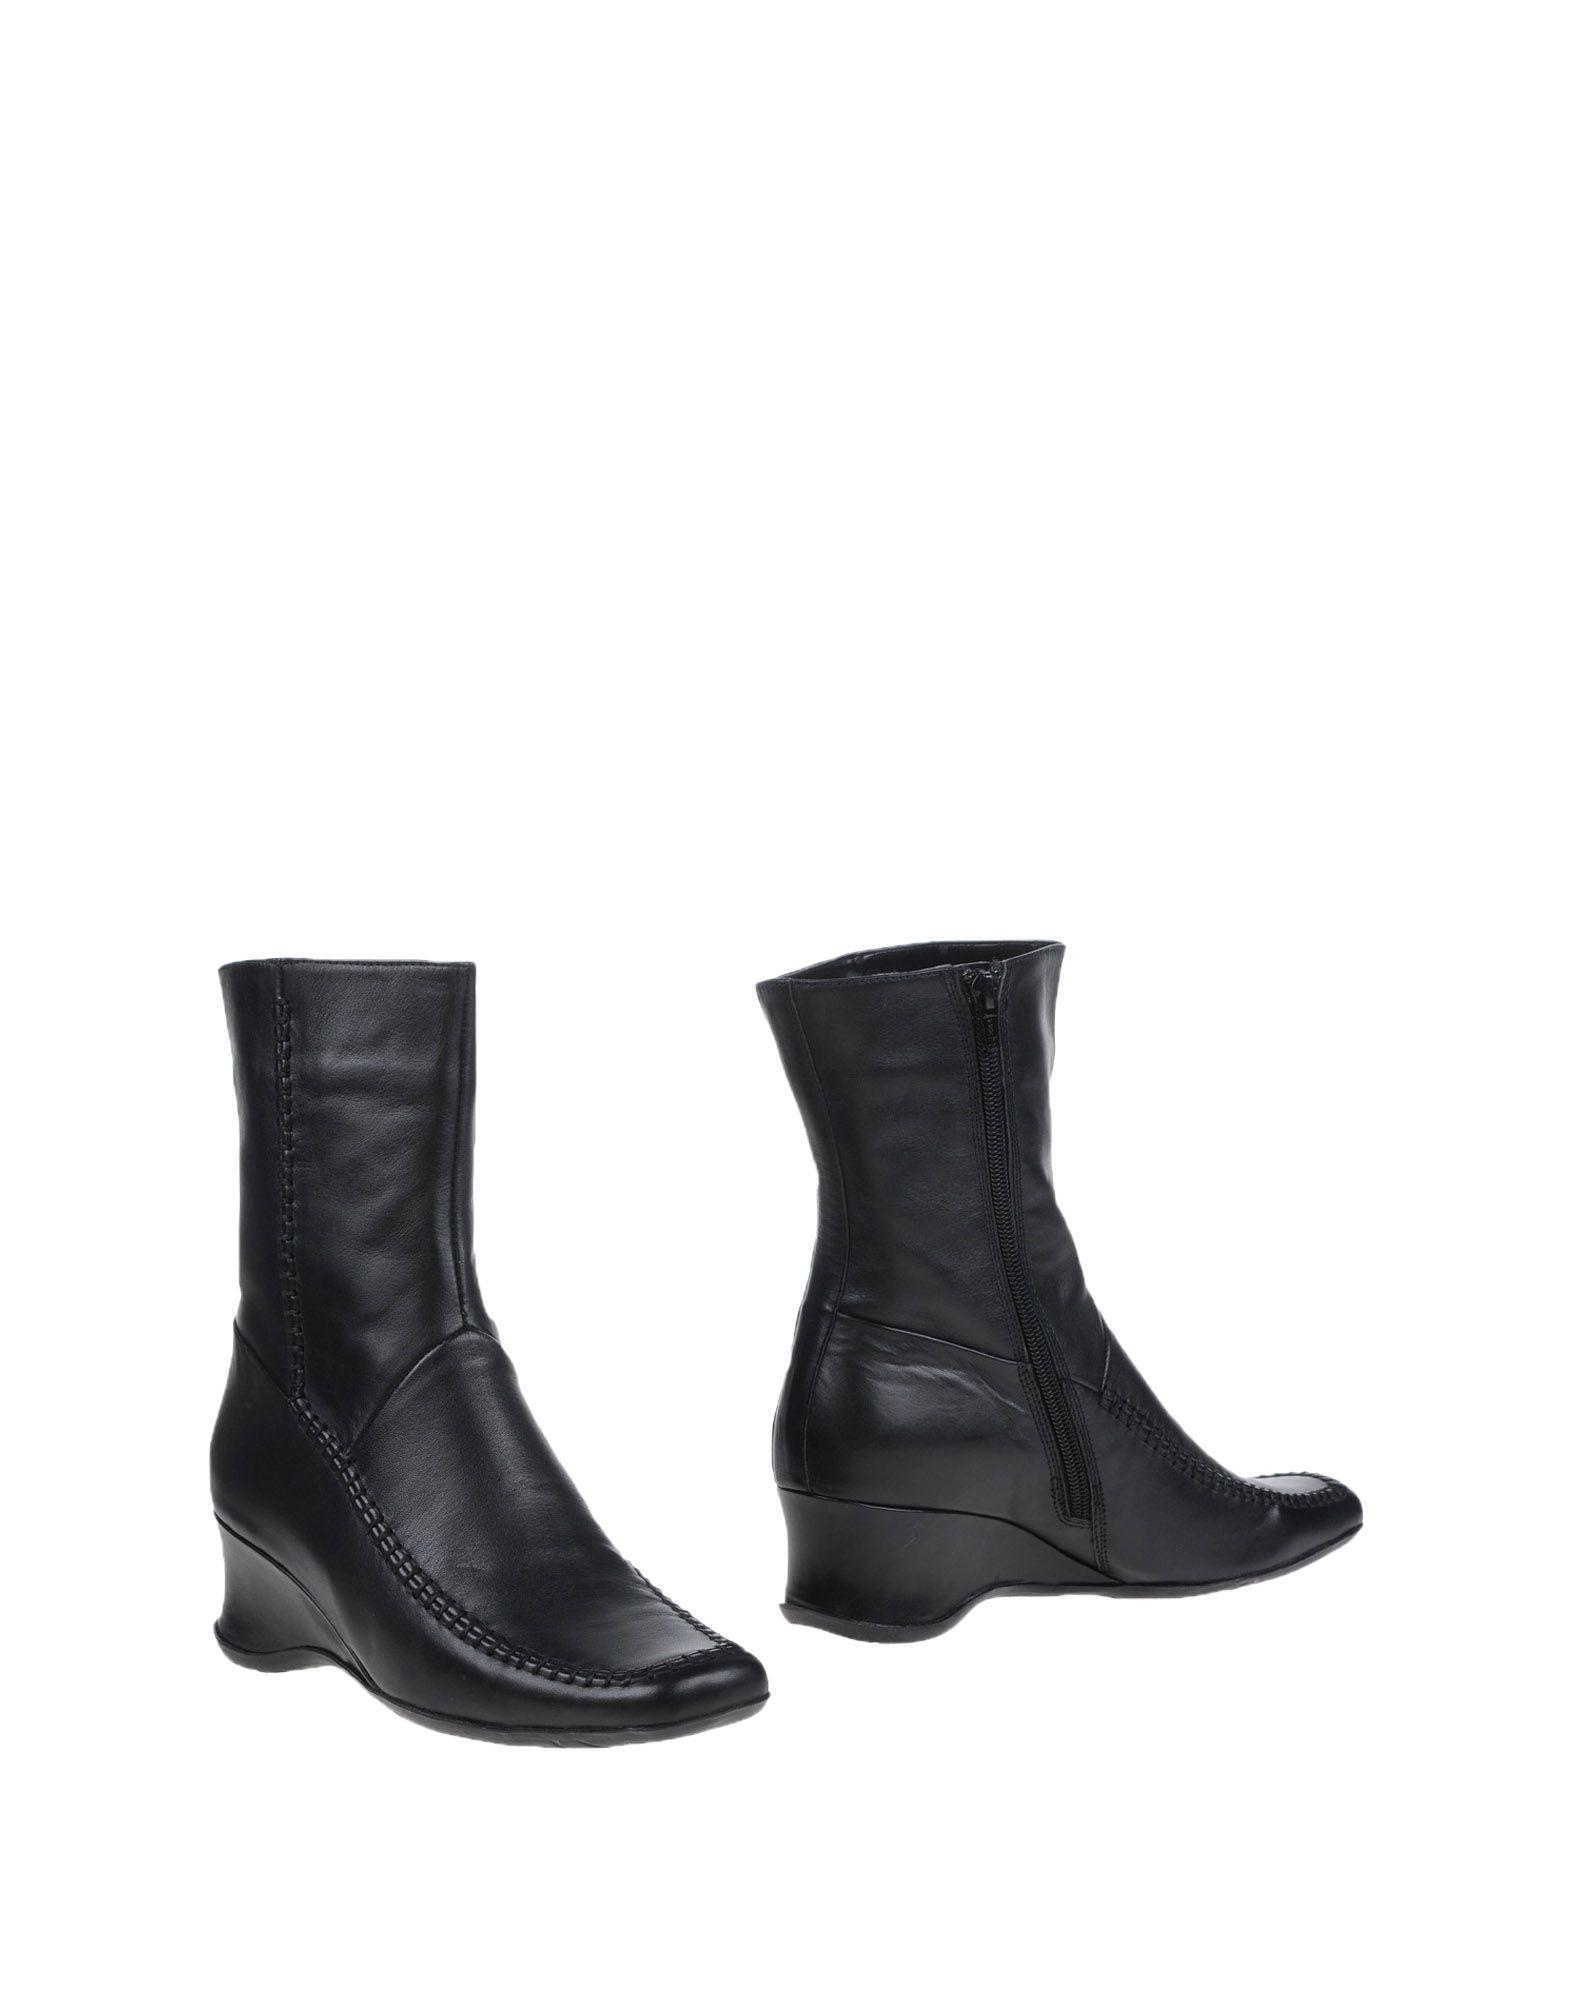 Next Stiefelette Damen    11018816MW Heiße Schuhe a482f0